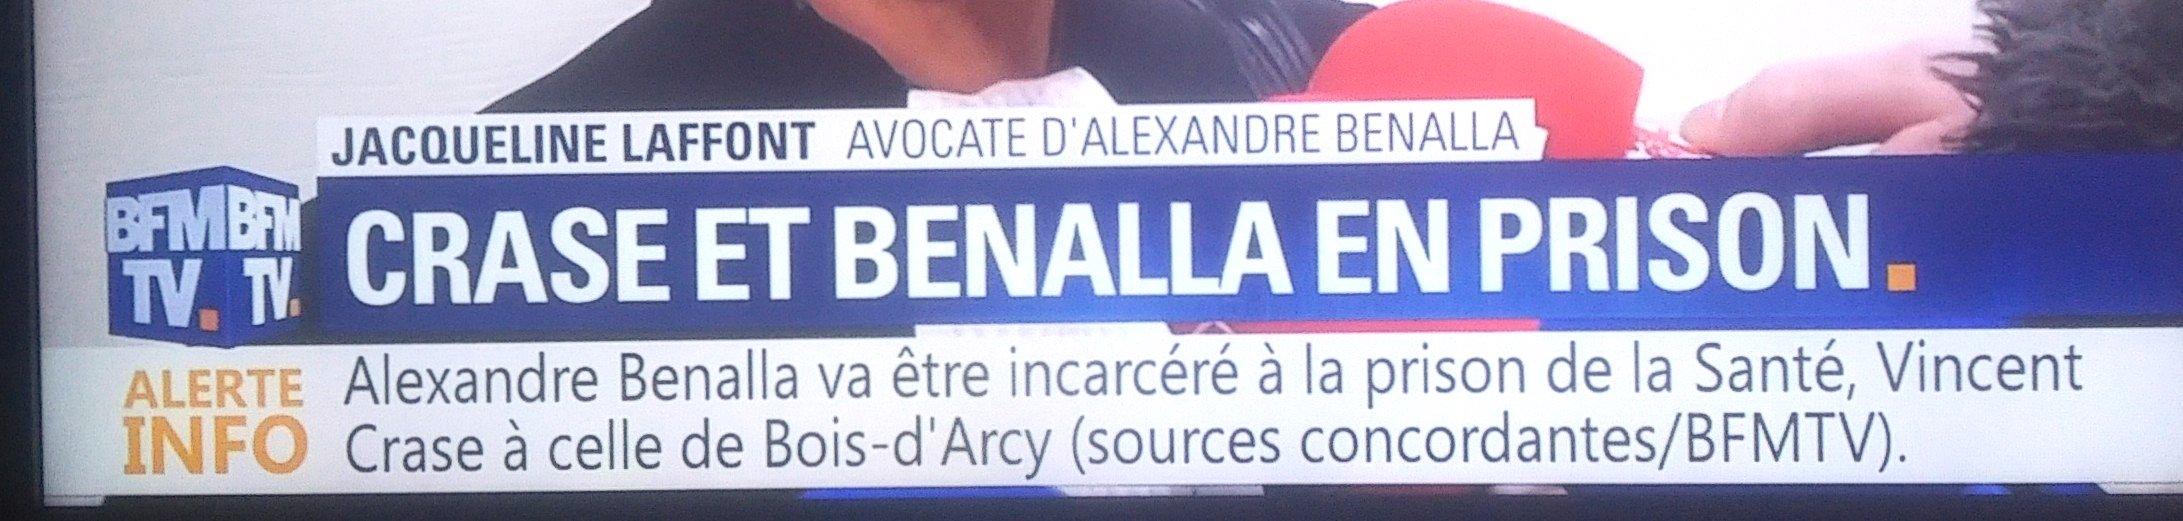 Benalla Crase Prison #çaSuffit Affaire BenallaMacron